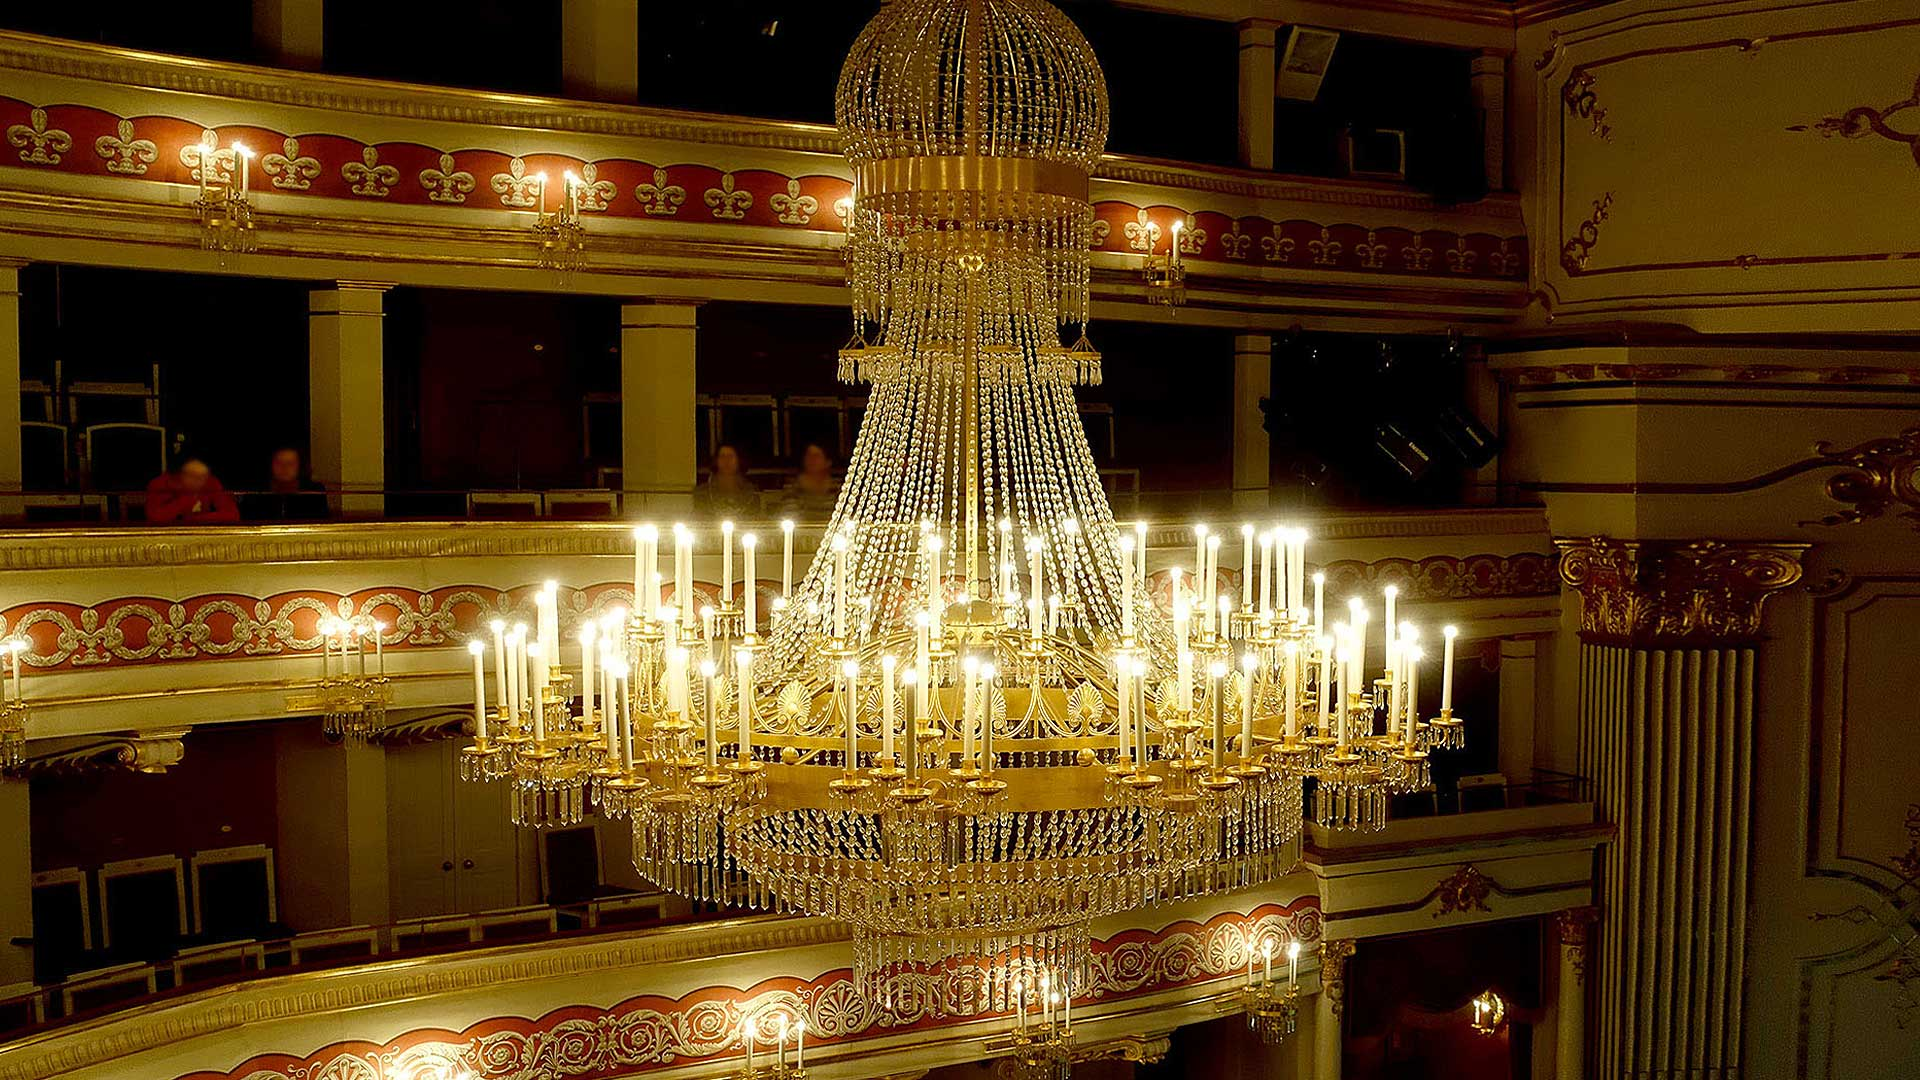 Theaterfreunde Bild 02